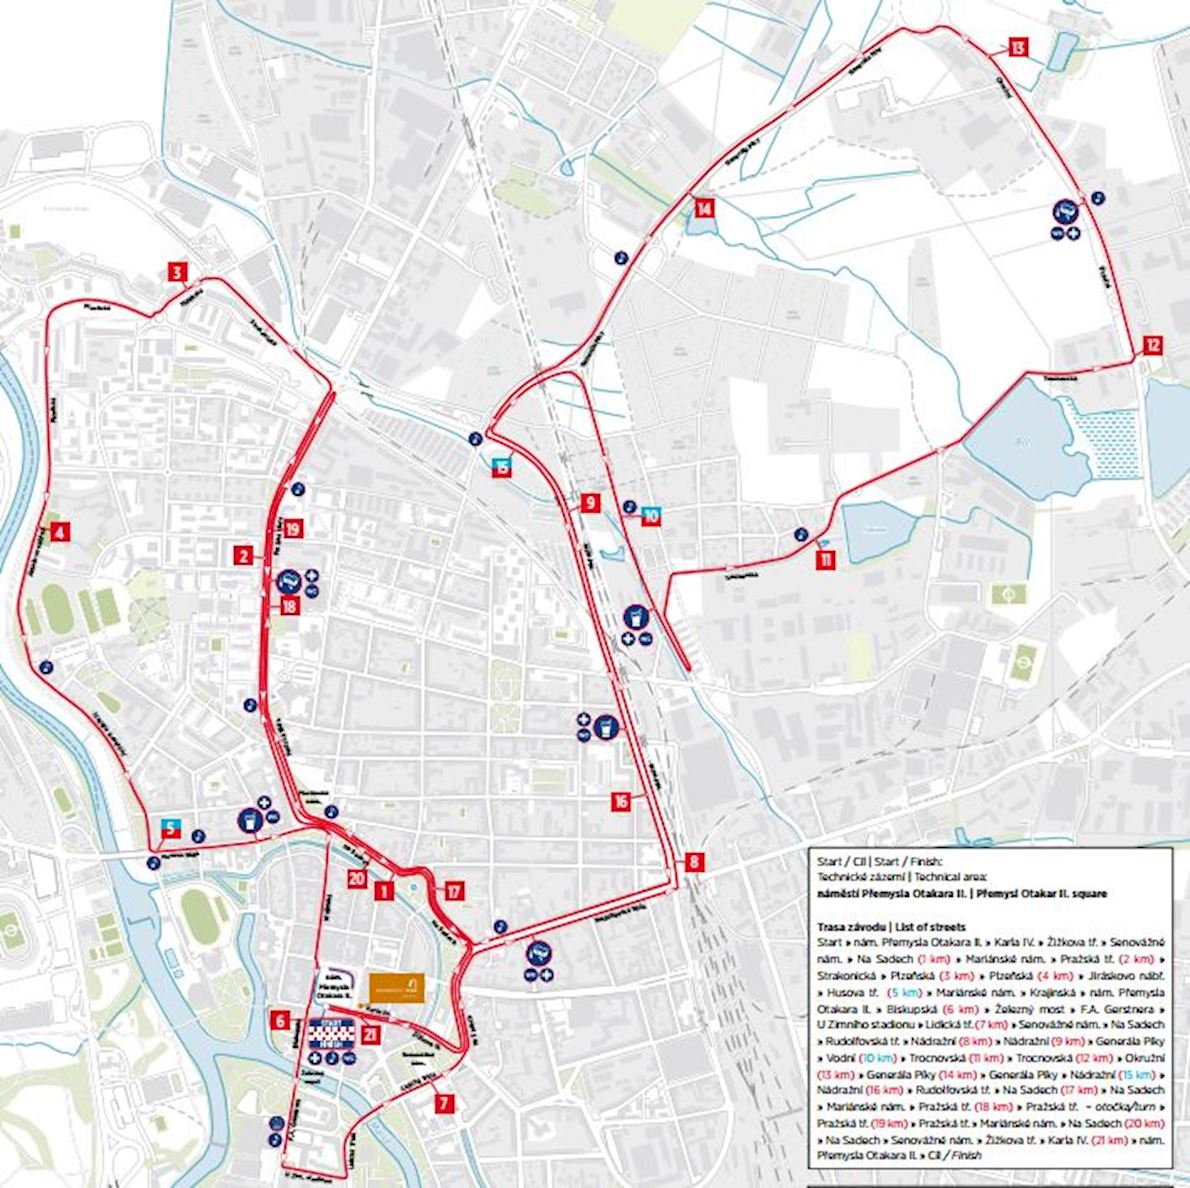 Mattoni Česke Budějovice Half Marathon Mappa del percorso